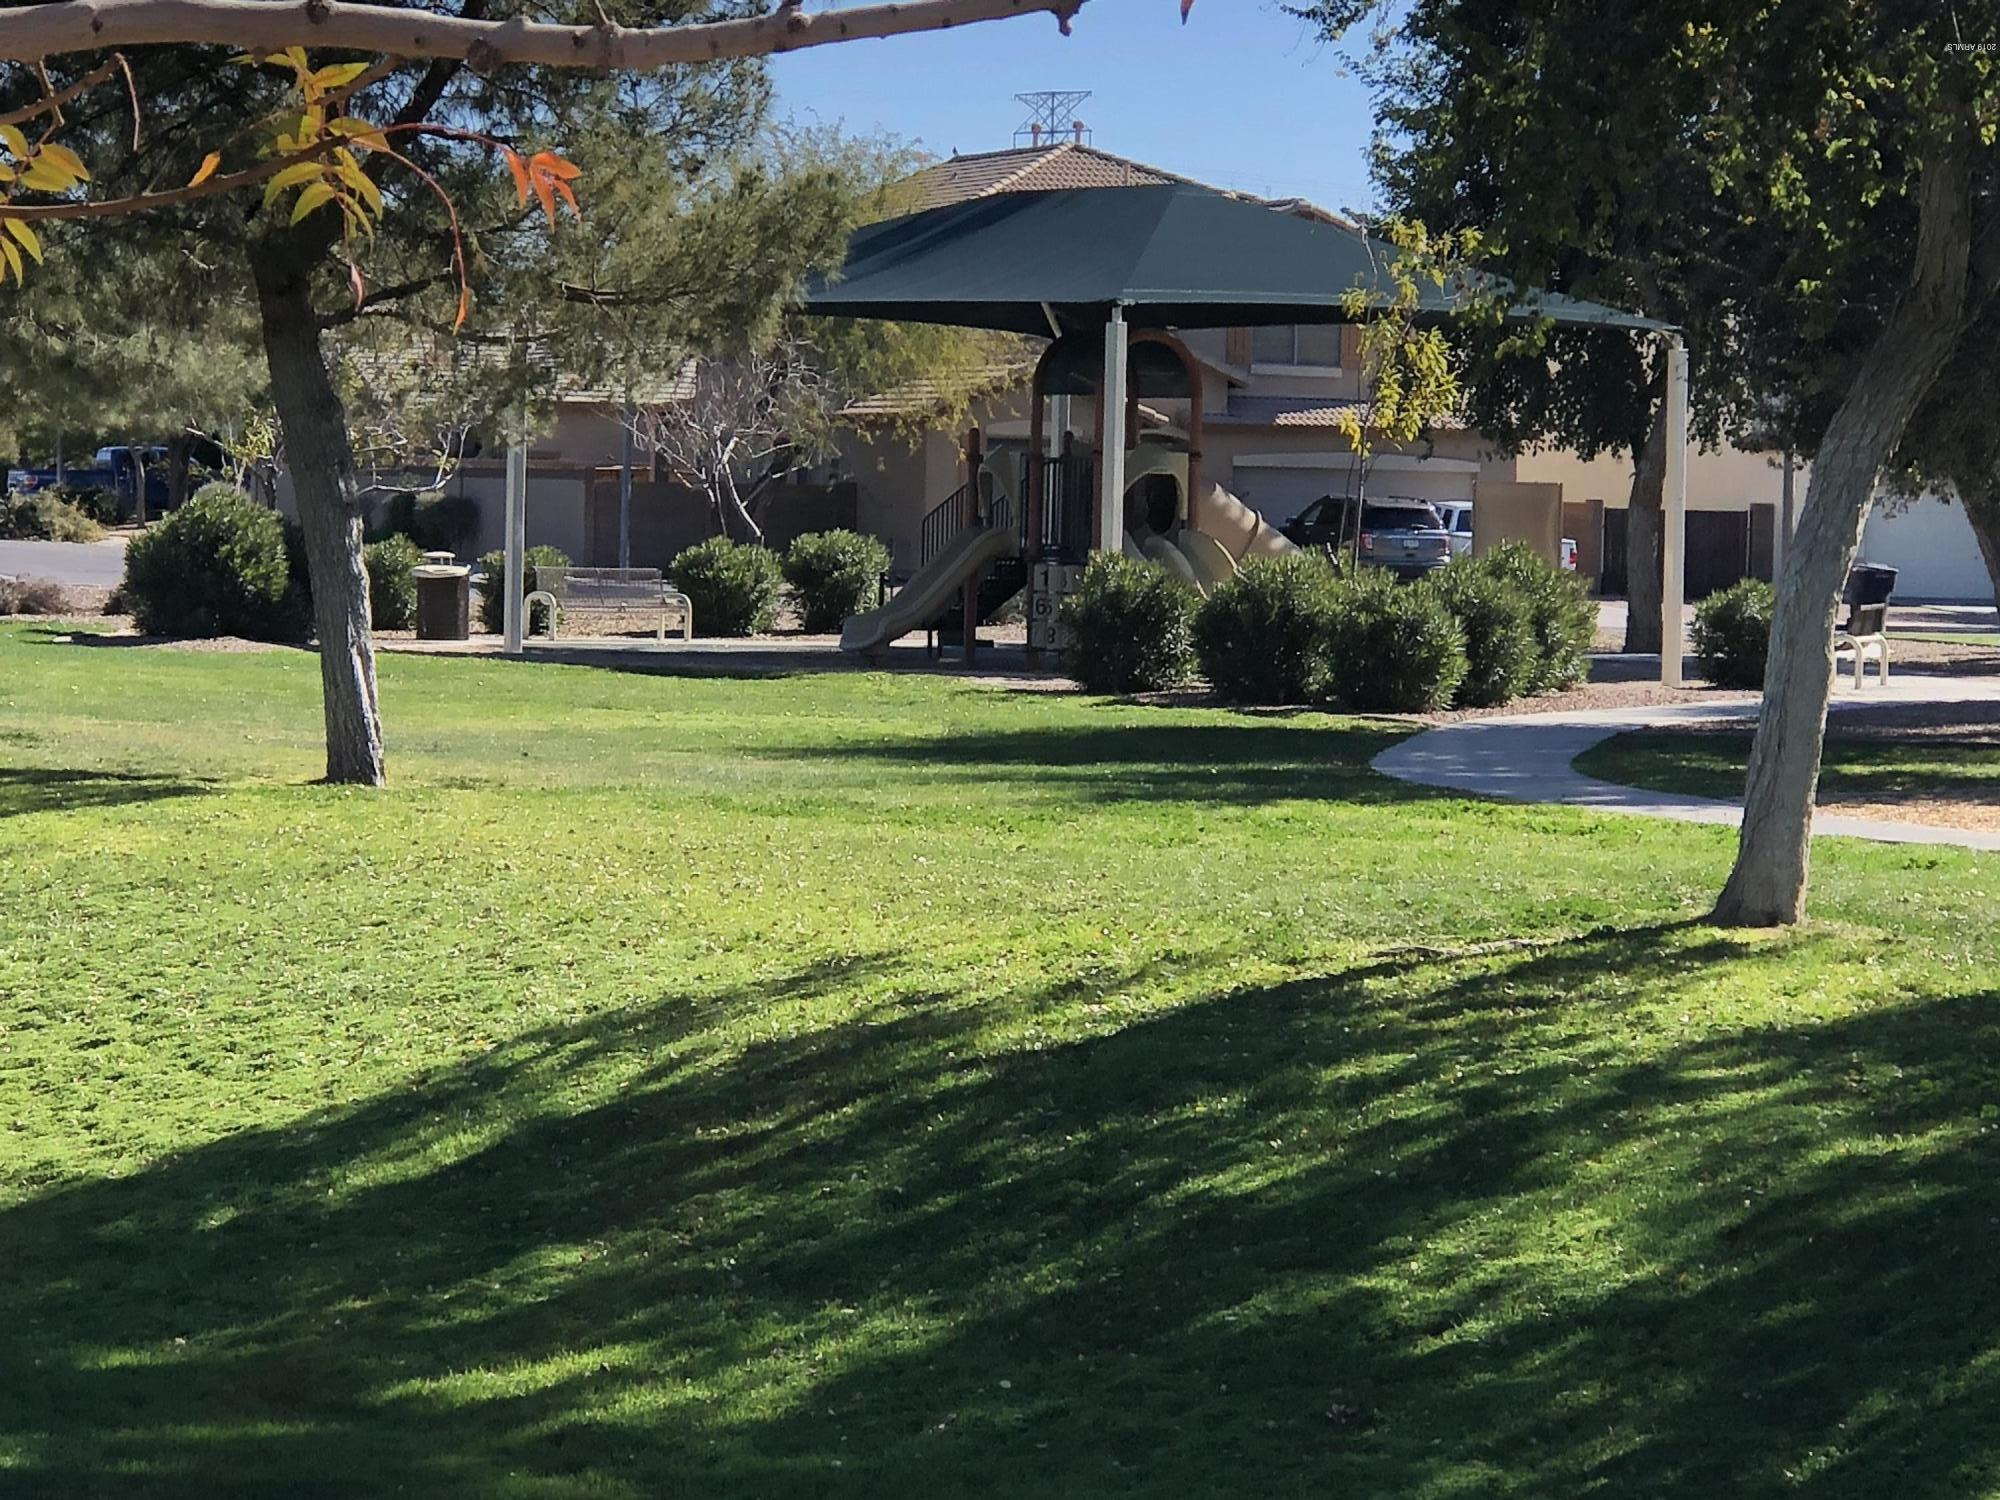 MLS 5872074 701 S 125TH Avenue, Avondale, AZ 85323 Avondale AZ Coldwater Springs